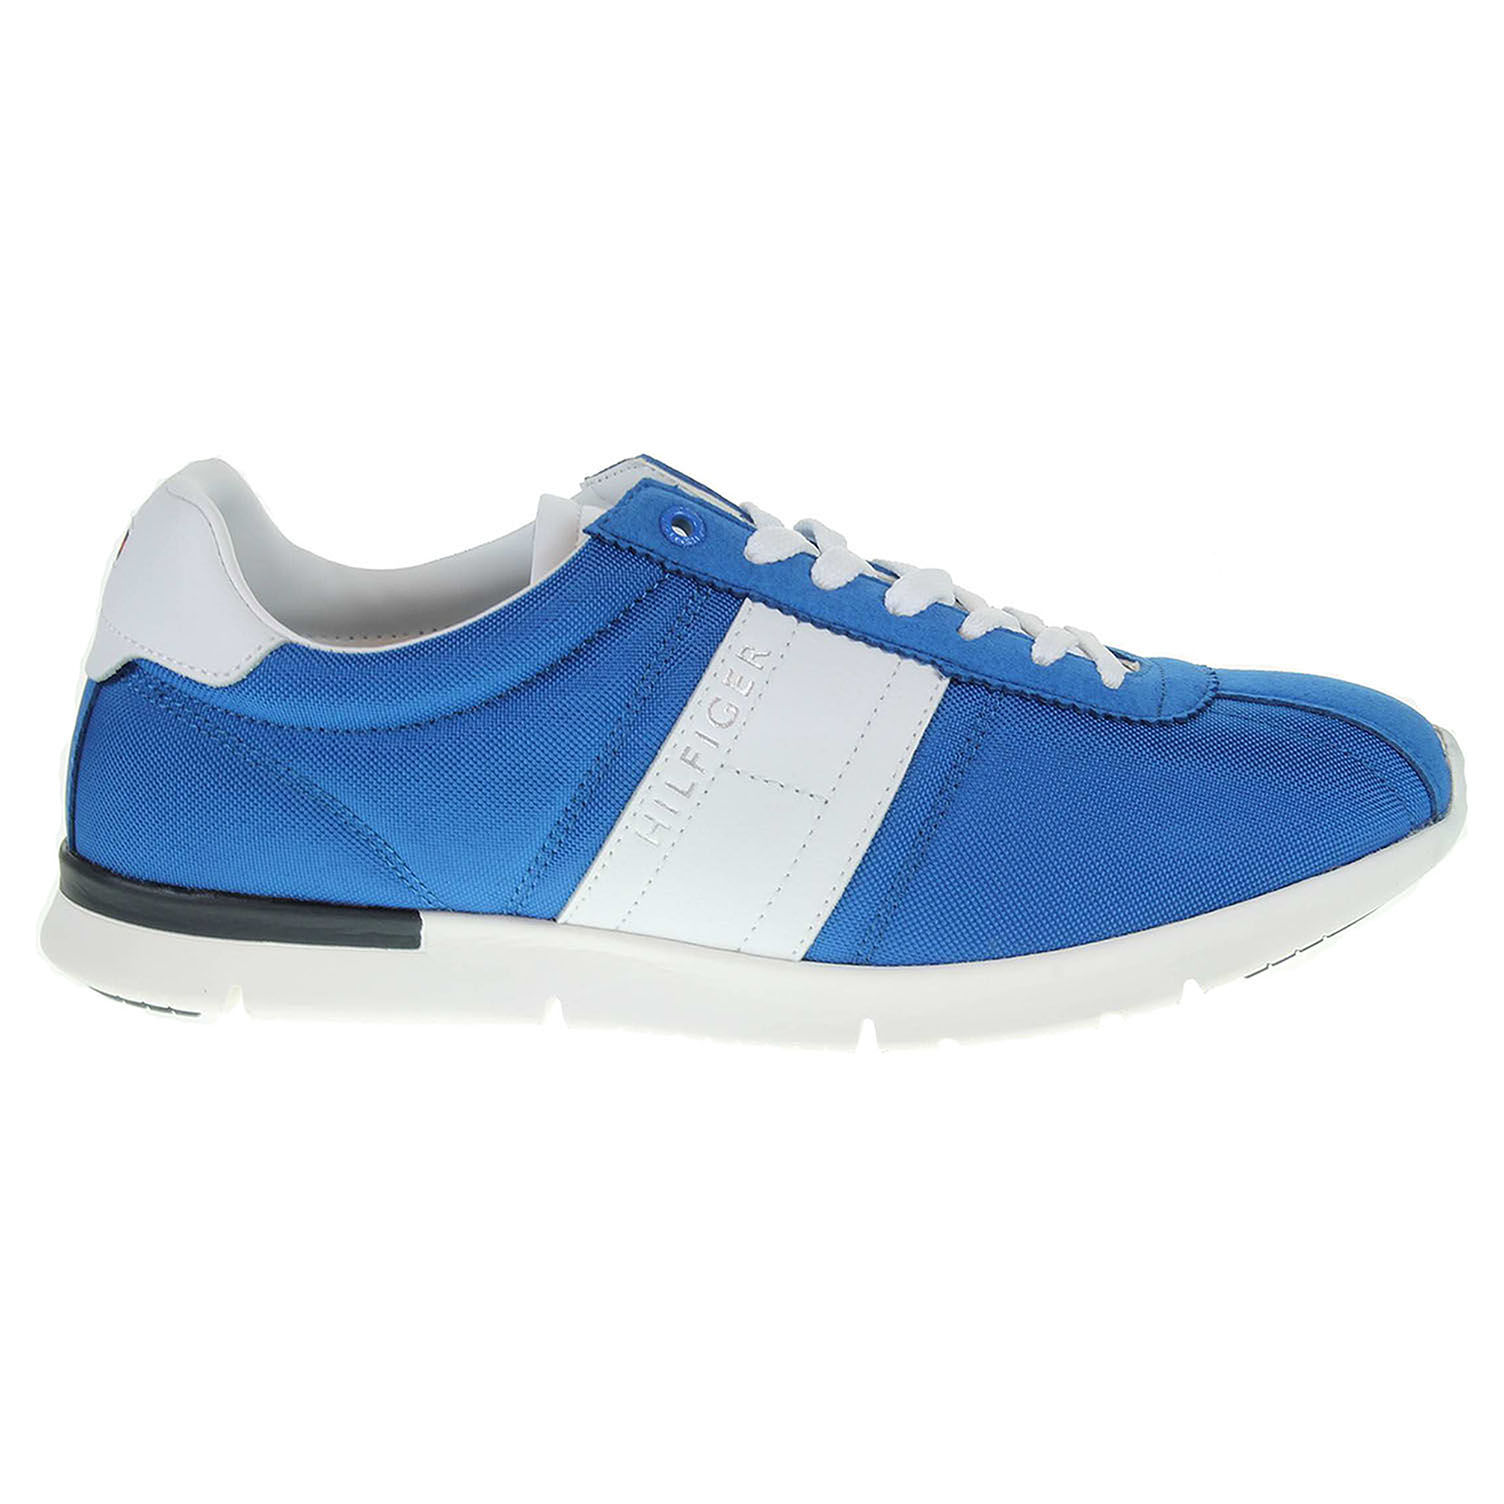 Ecco Tommy Hilfiger pánská obuv FM0FM00306 T2285OBIAS 9C modrá 24000441